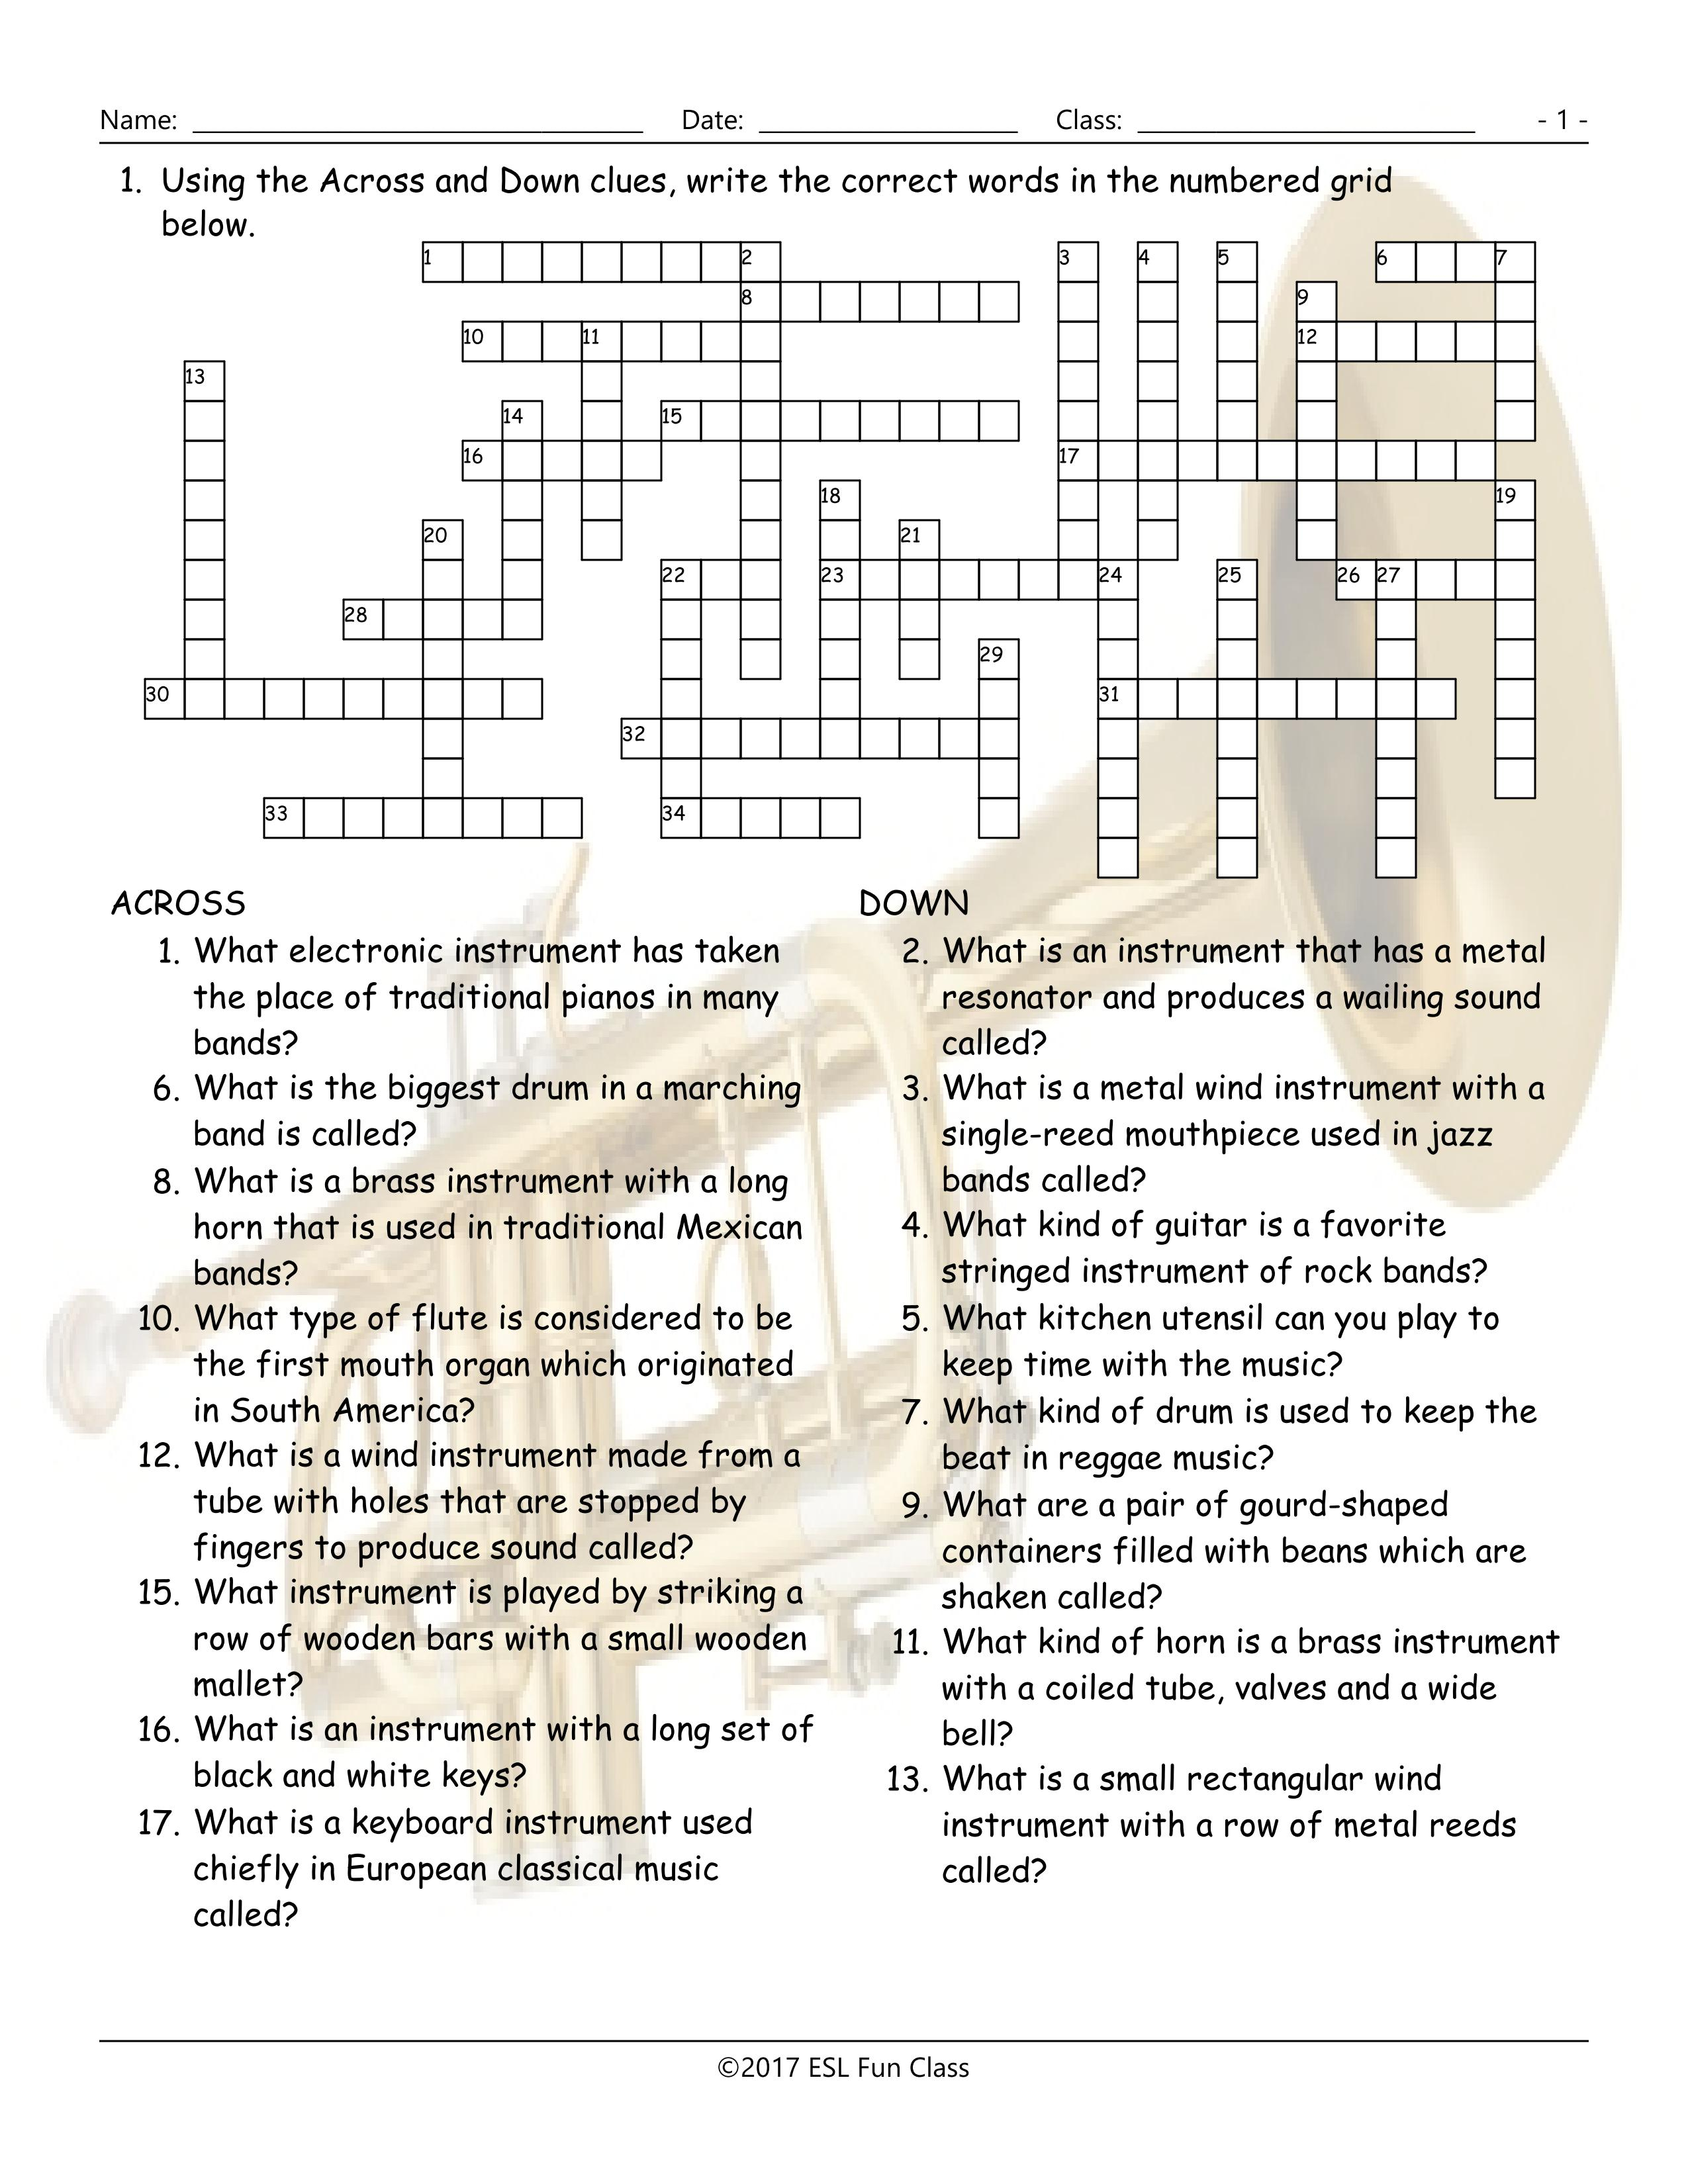 Musical Instruments Crossword Puzzle Worksheet-Esl Fun Games-Have Fun! - Printable Esl Crossword Puzzles